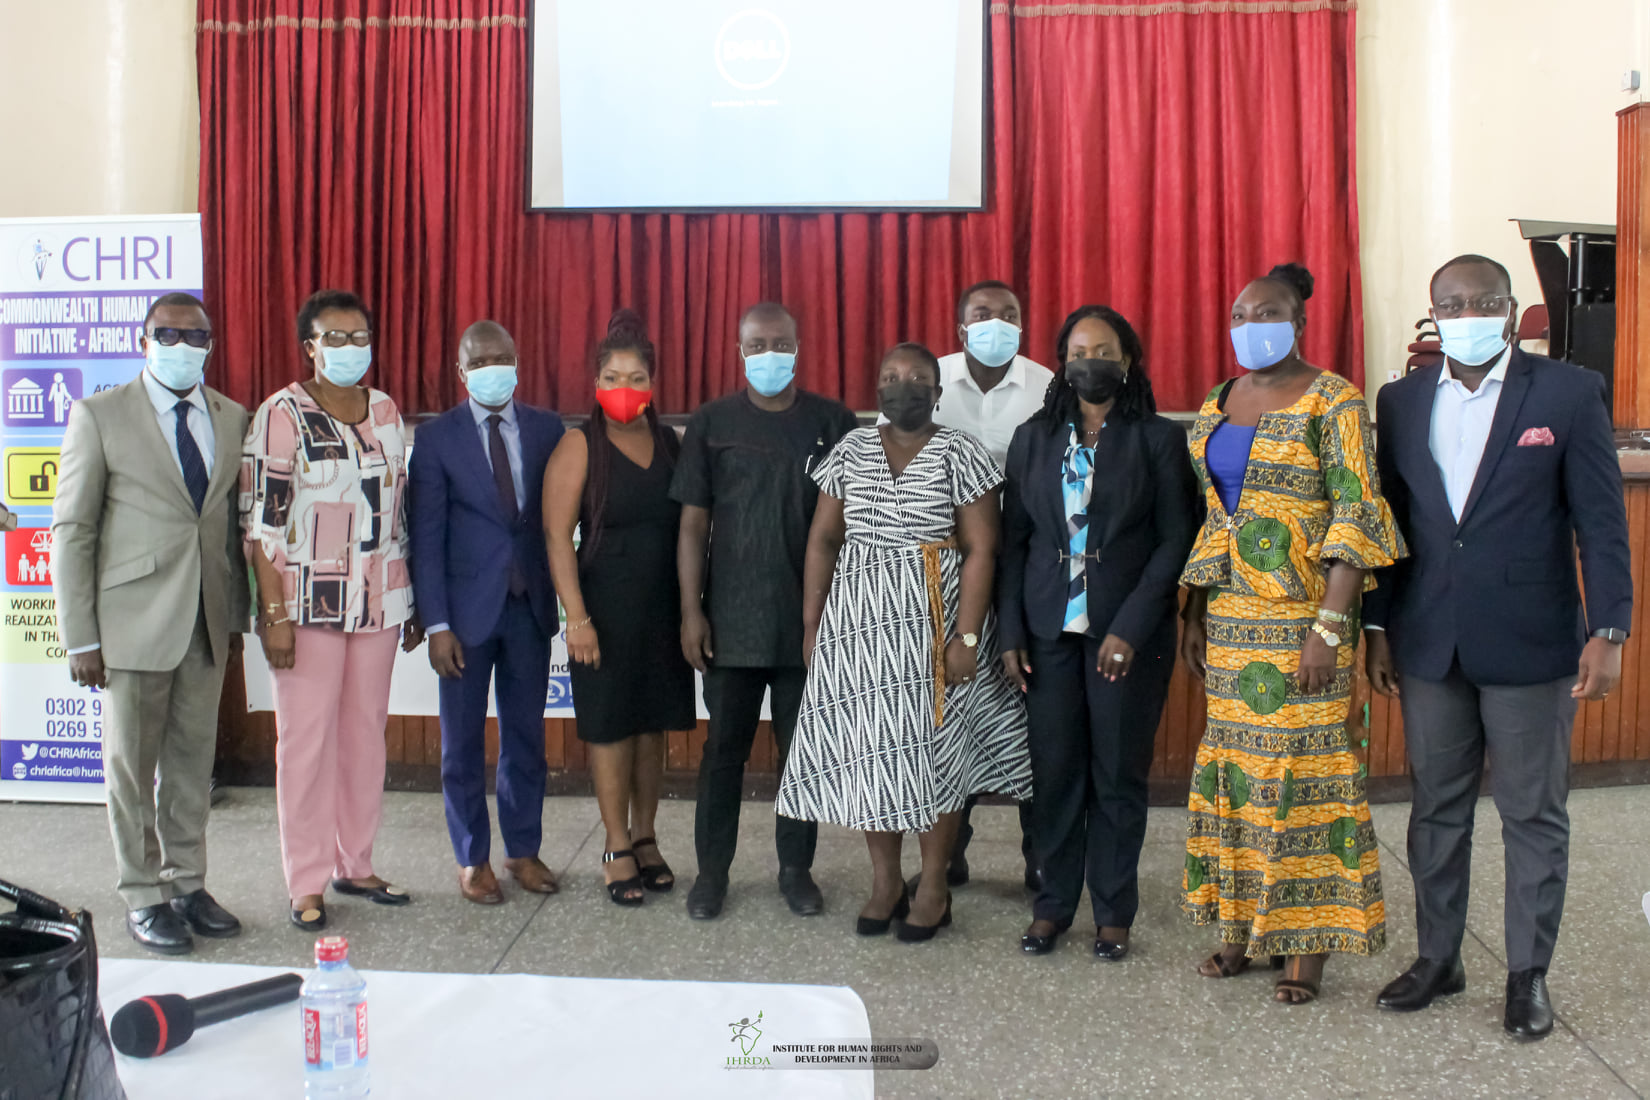 IHRDA organizes child rights strategic litigation workshop for Ghana lawyers, CSOs